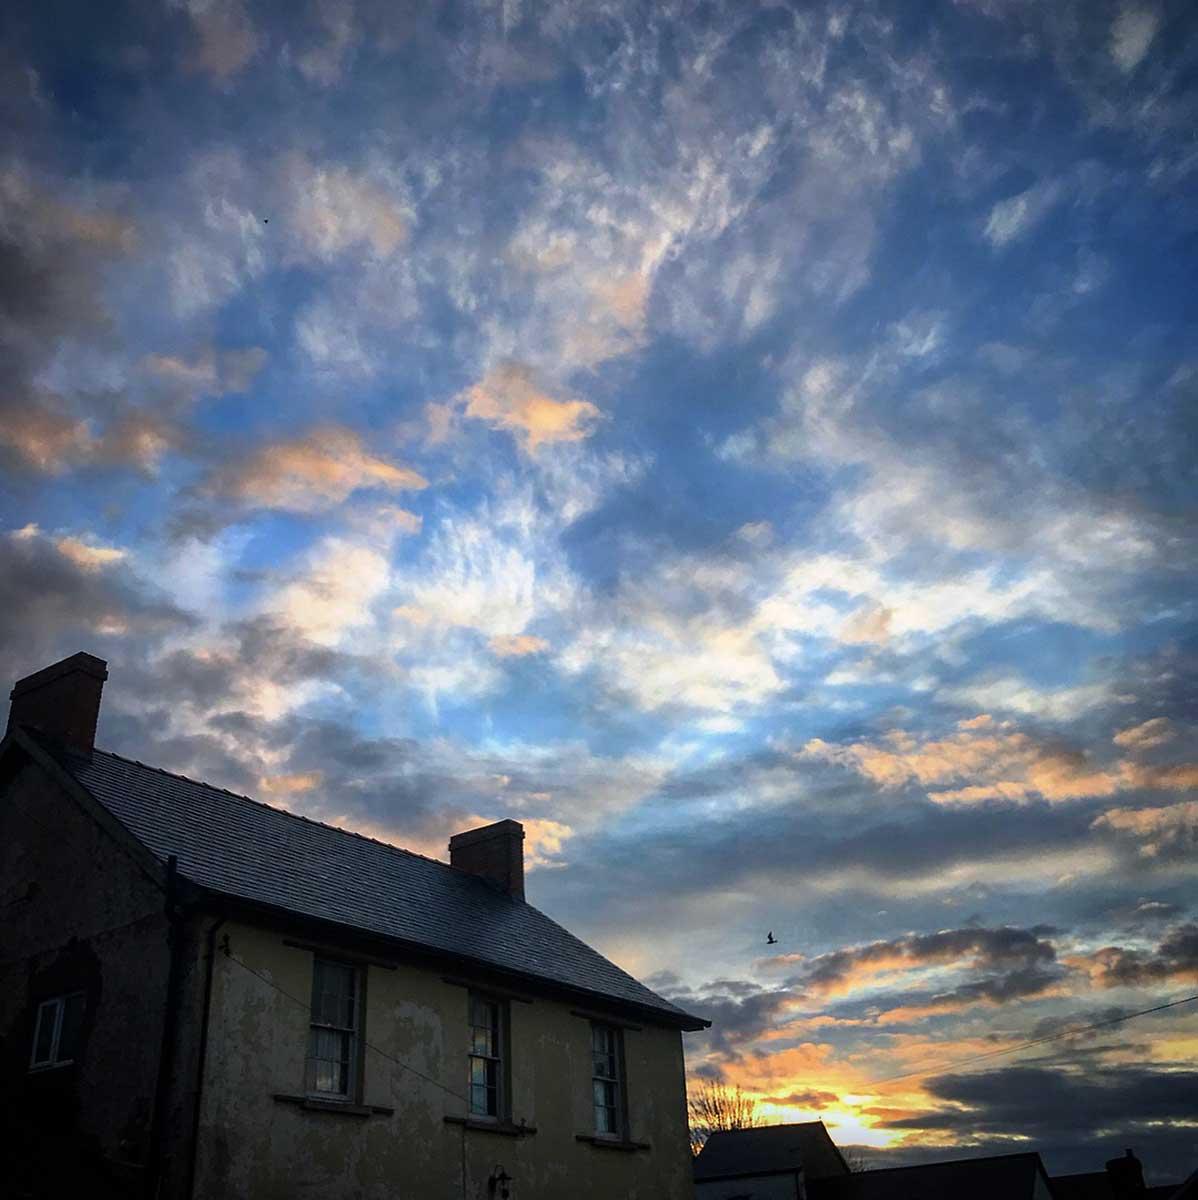 Wintry sunset over Llantwit Major, December 2017